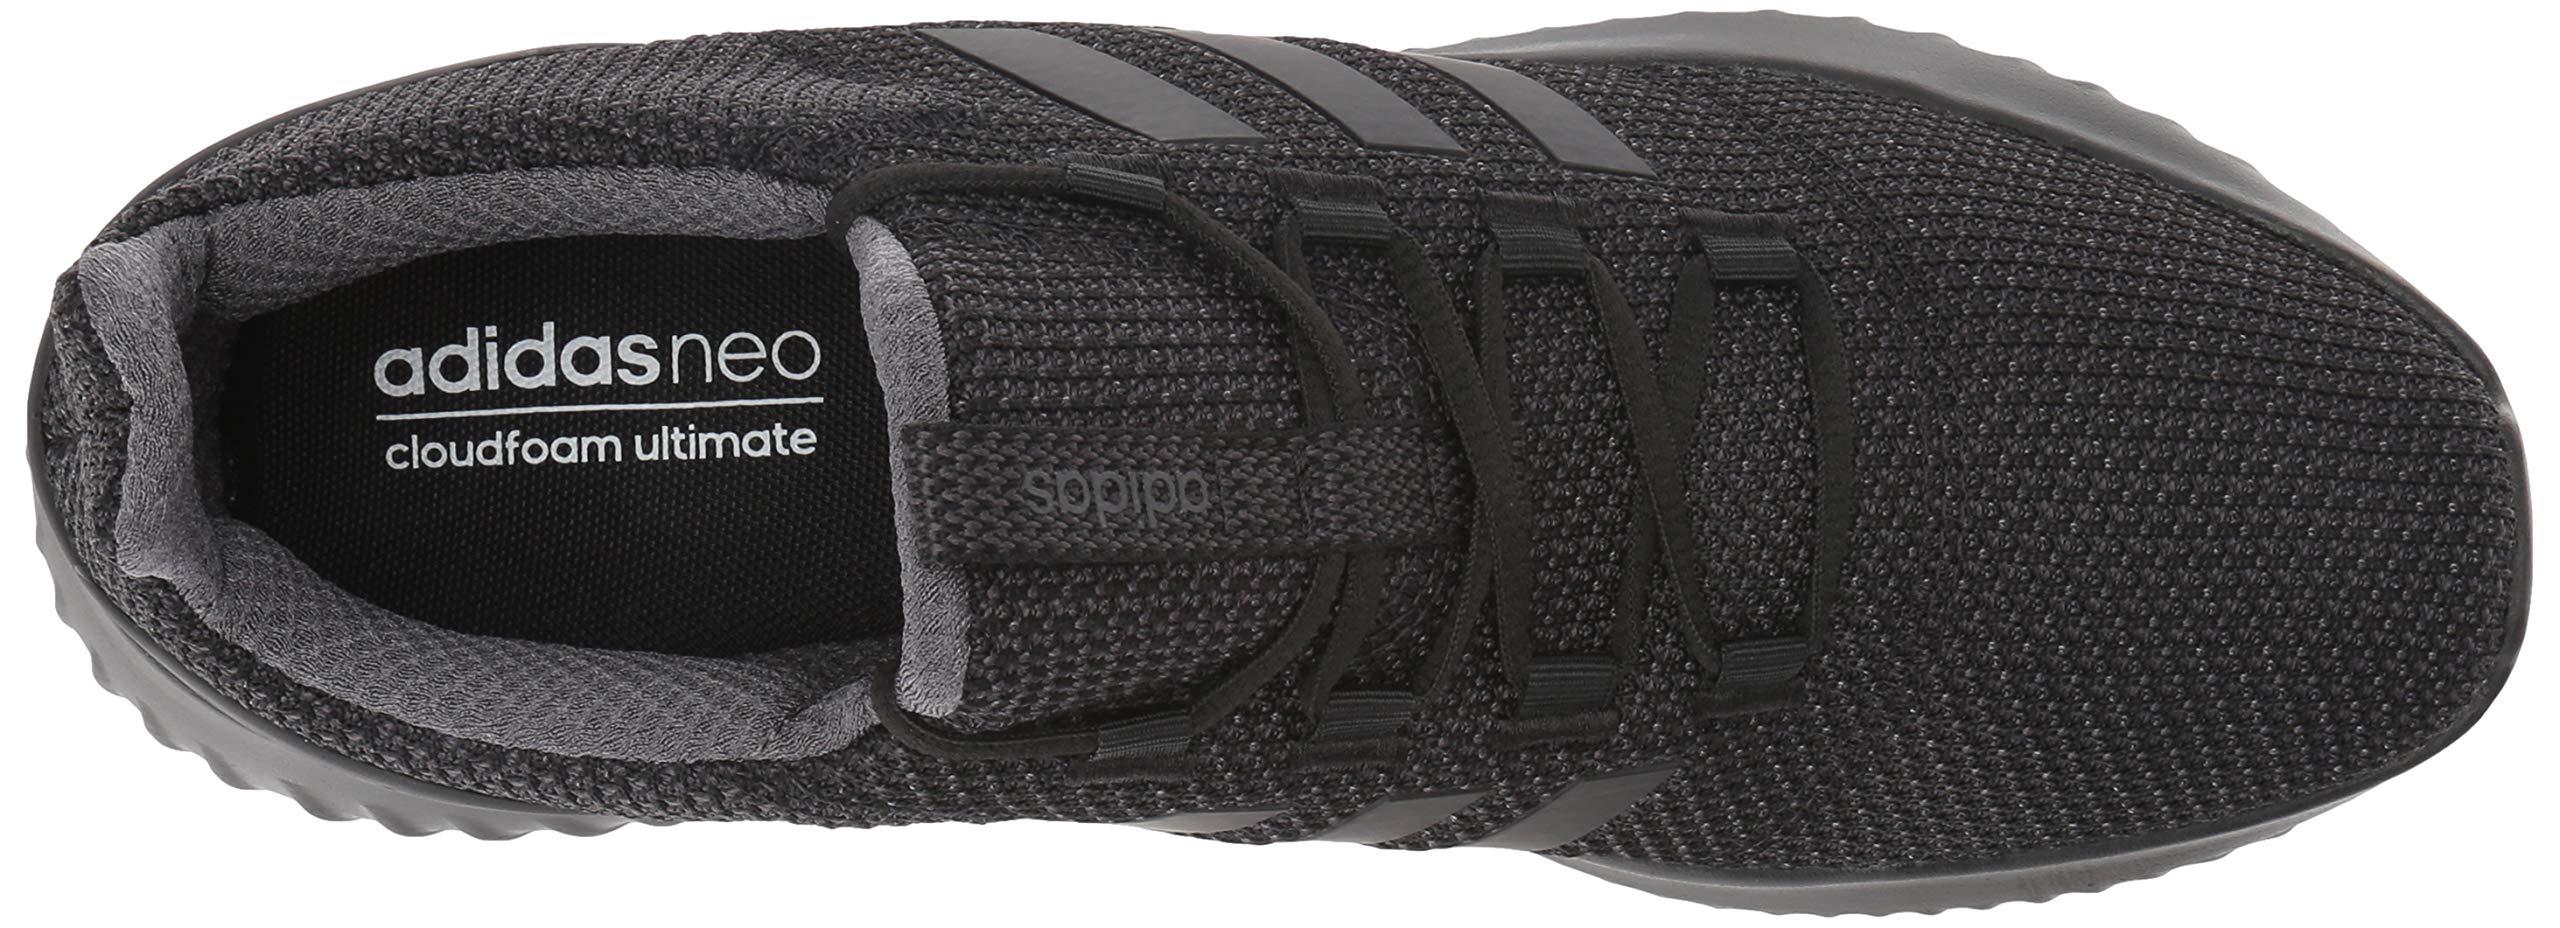 adidas Men's Cloudfoam Ultimate Running Shoe Utility Black, 9.5 M US by adidas (Image #8)